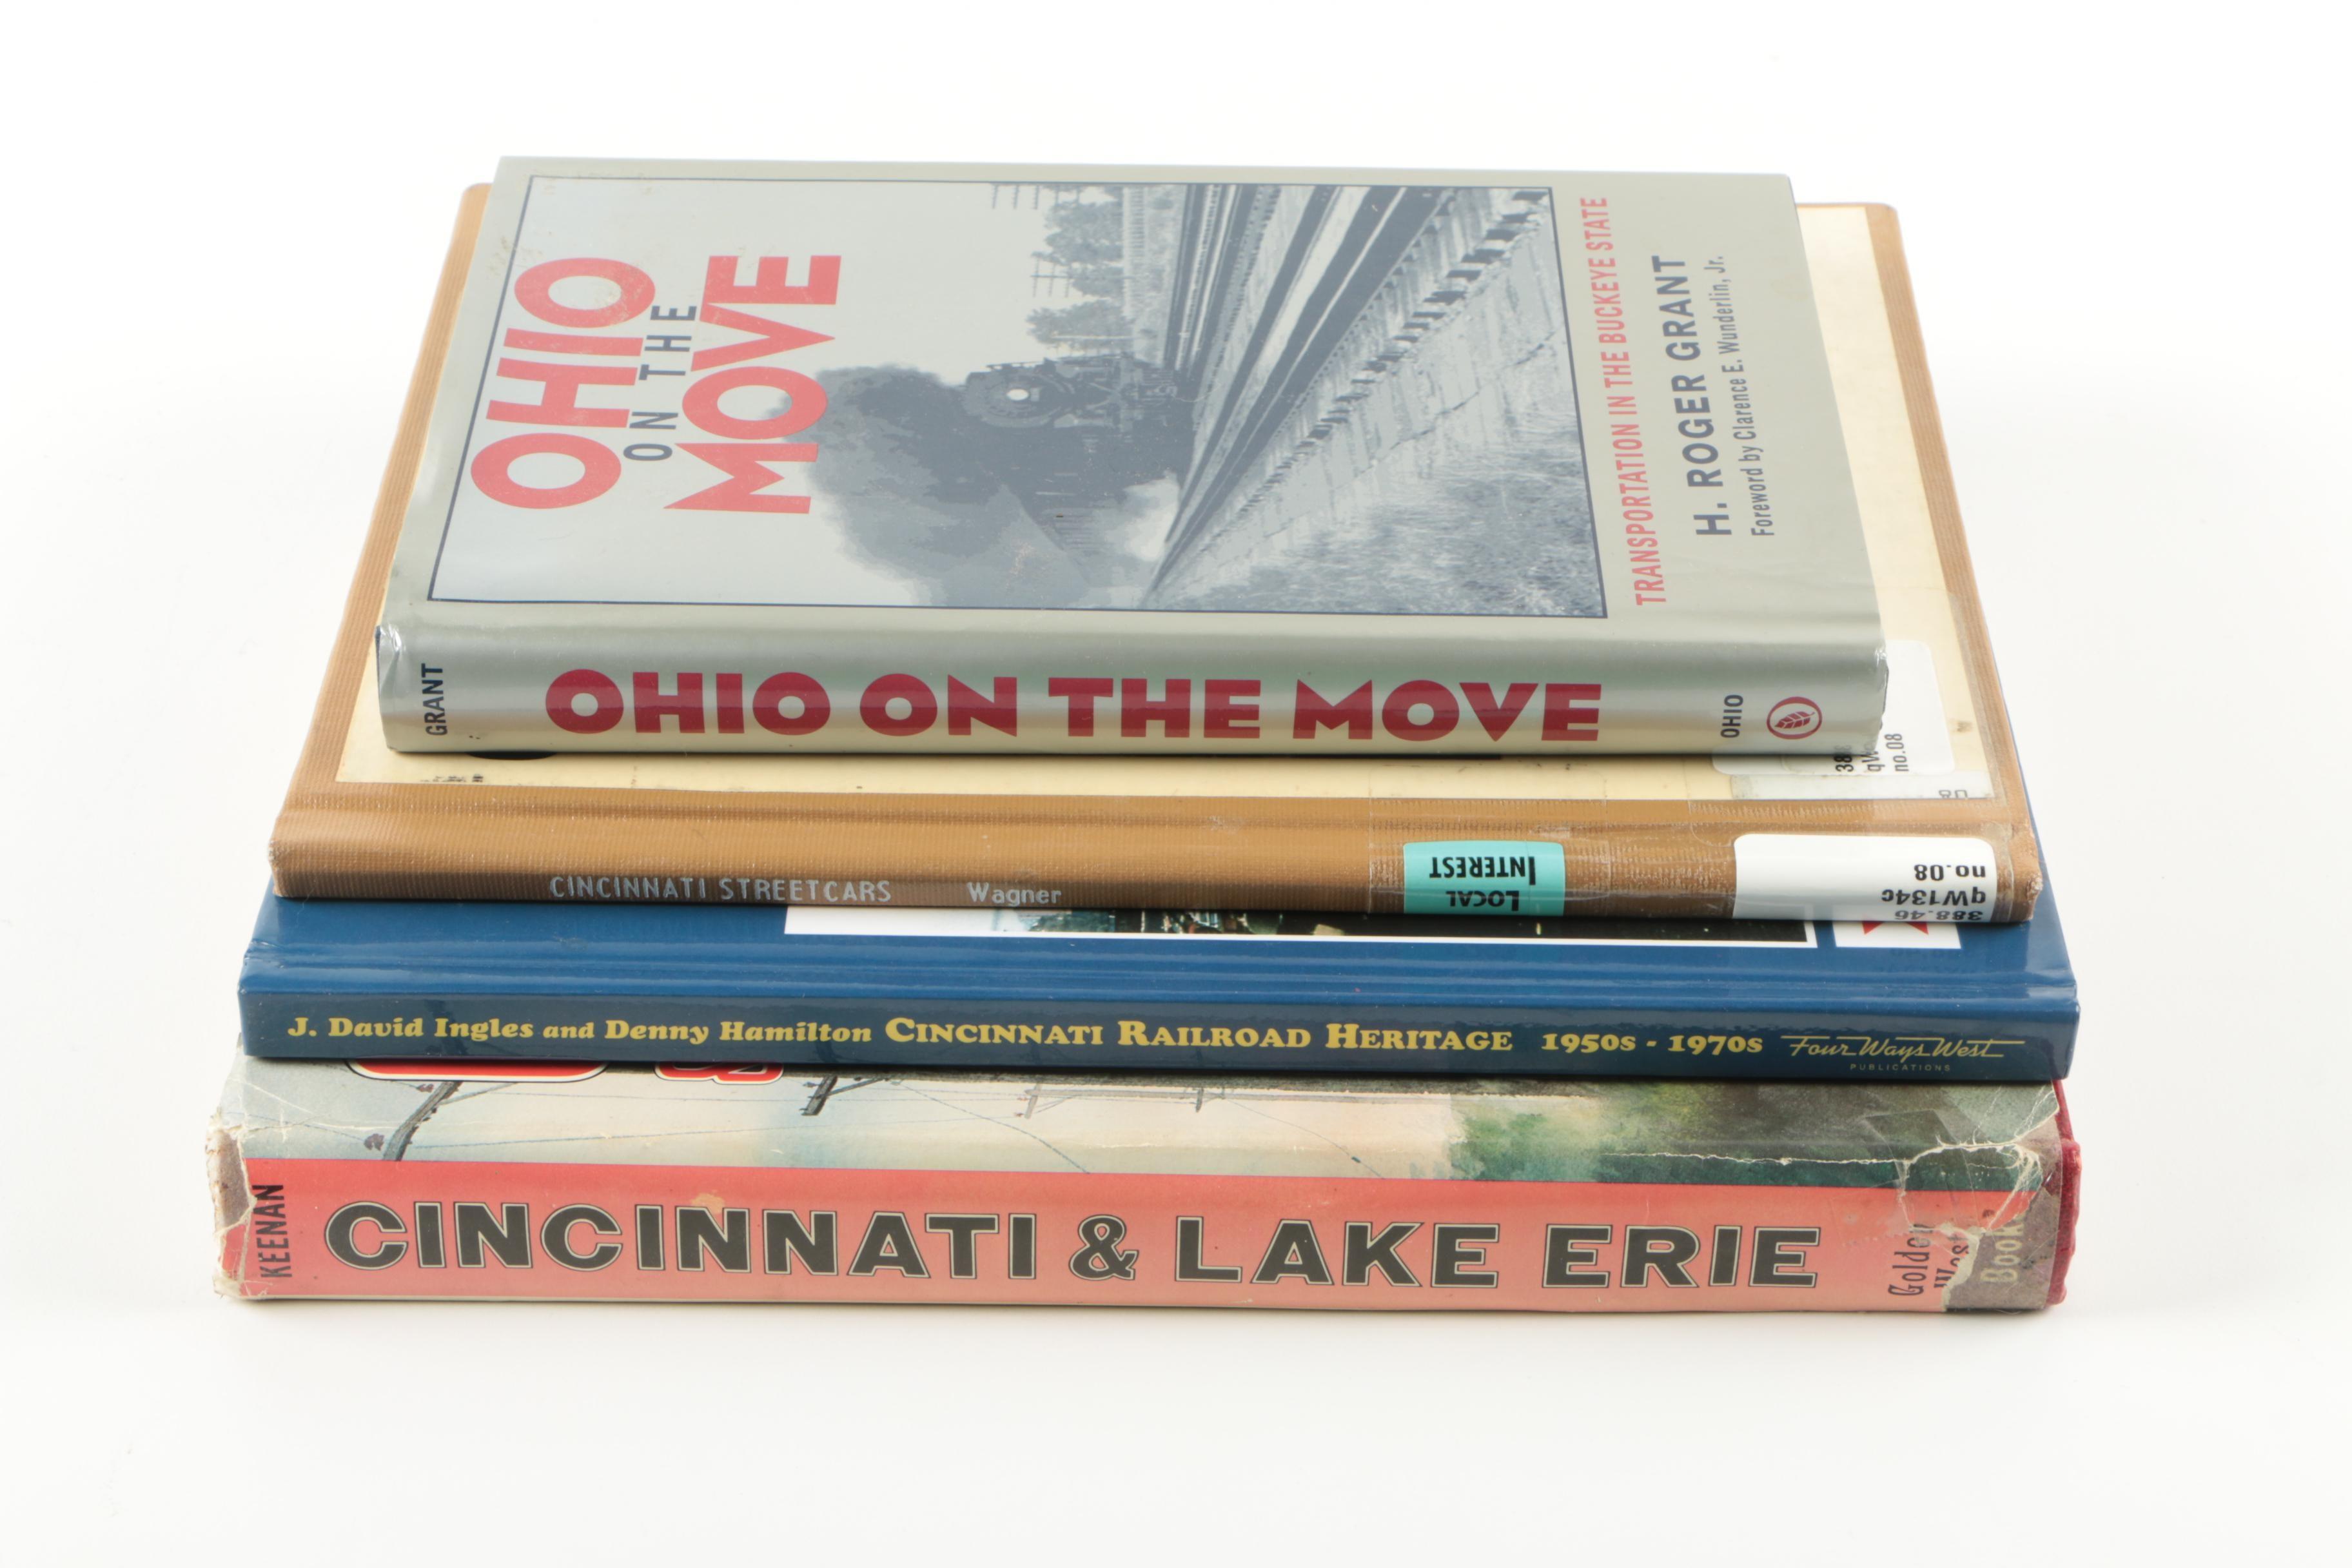 Assorted Books on Cincinnati and Ohio Transportation History